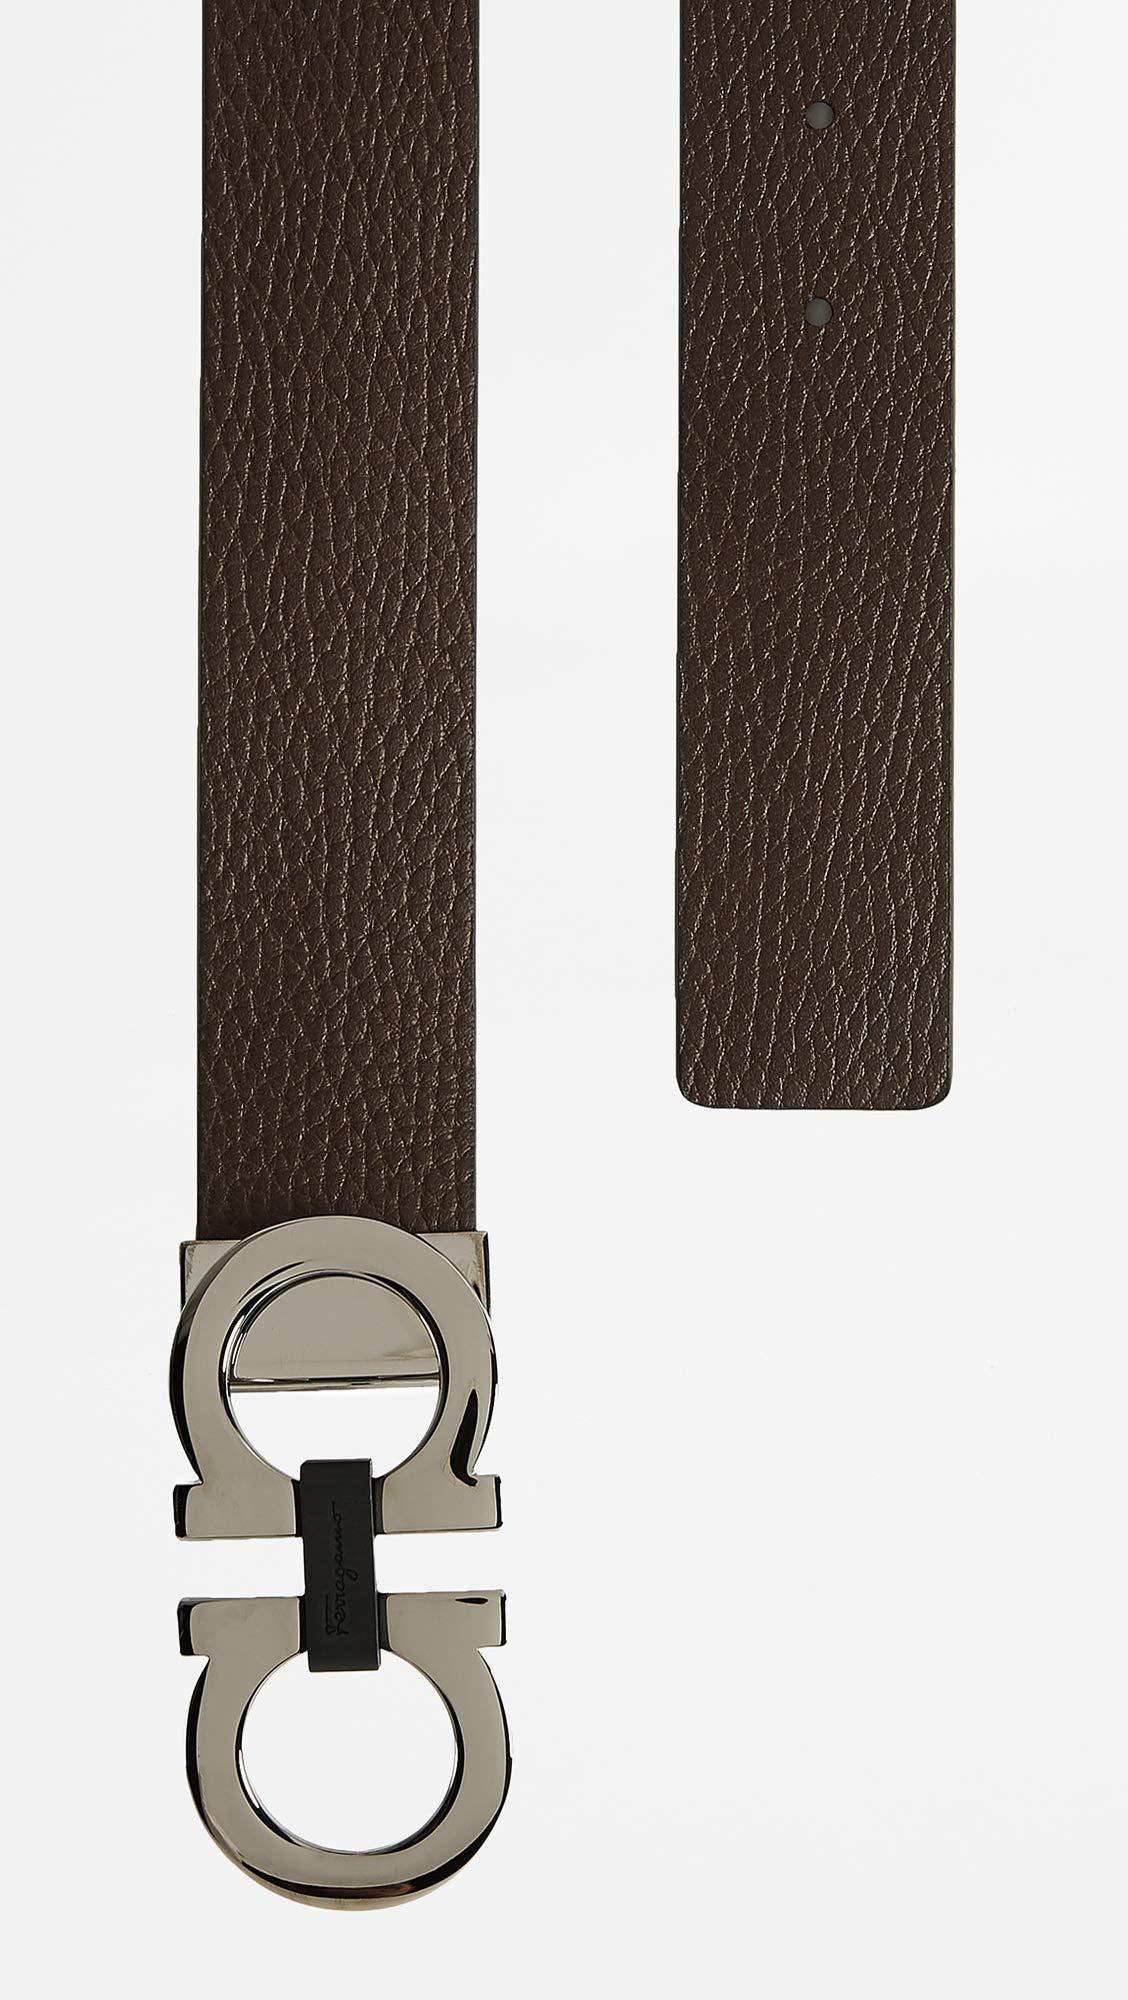 Salvatore Ferragamo Men's Reversible/Adjustable Belt-678783, Nero/Hickory 36 by Salvatore Ferragamo (Image #4)